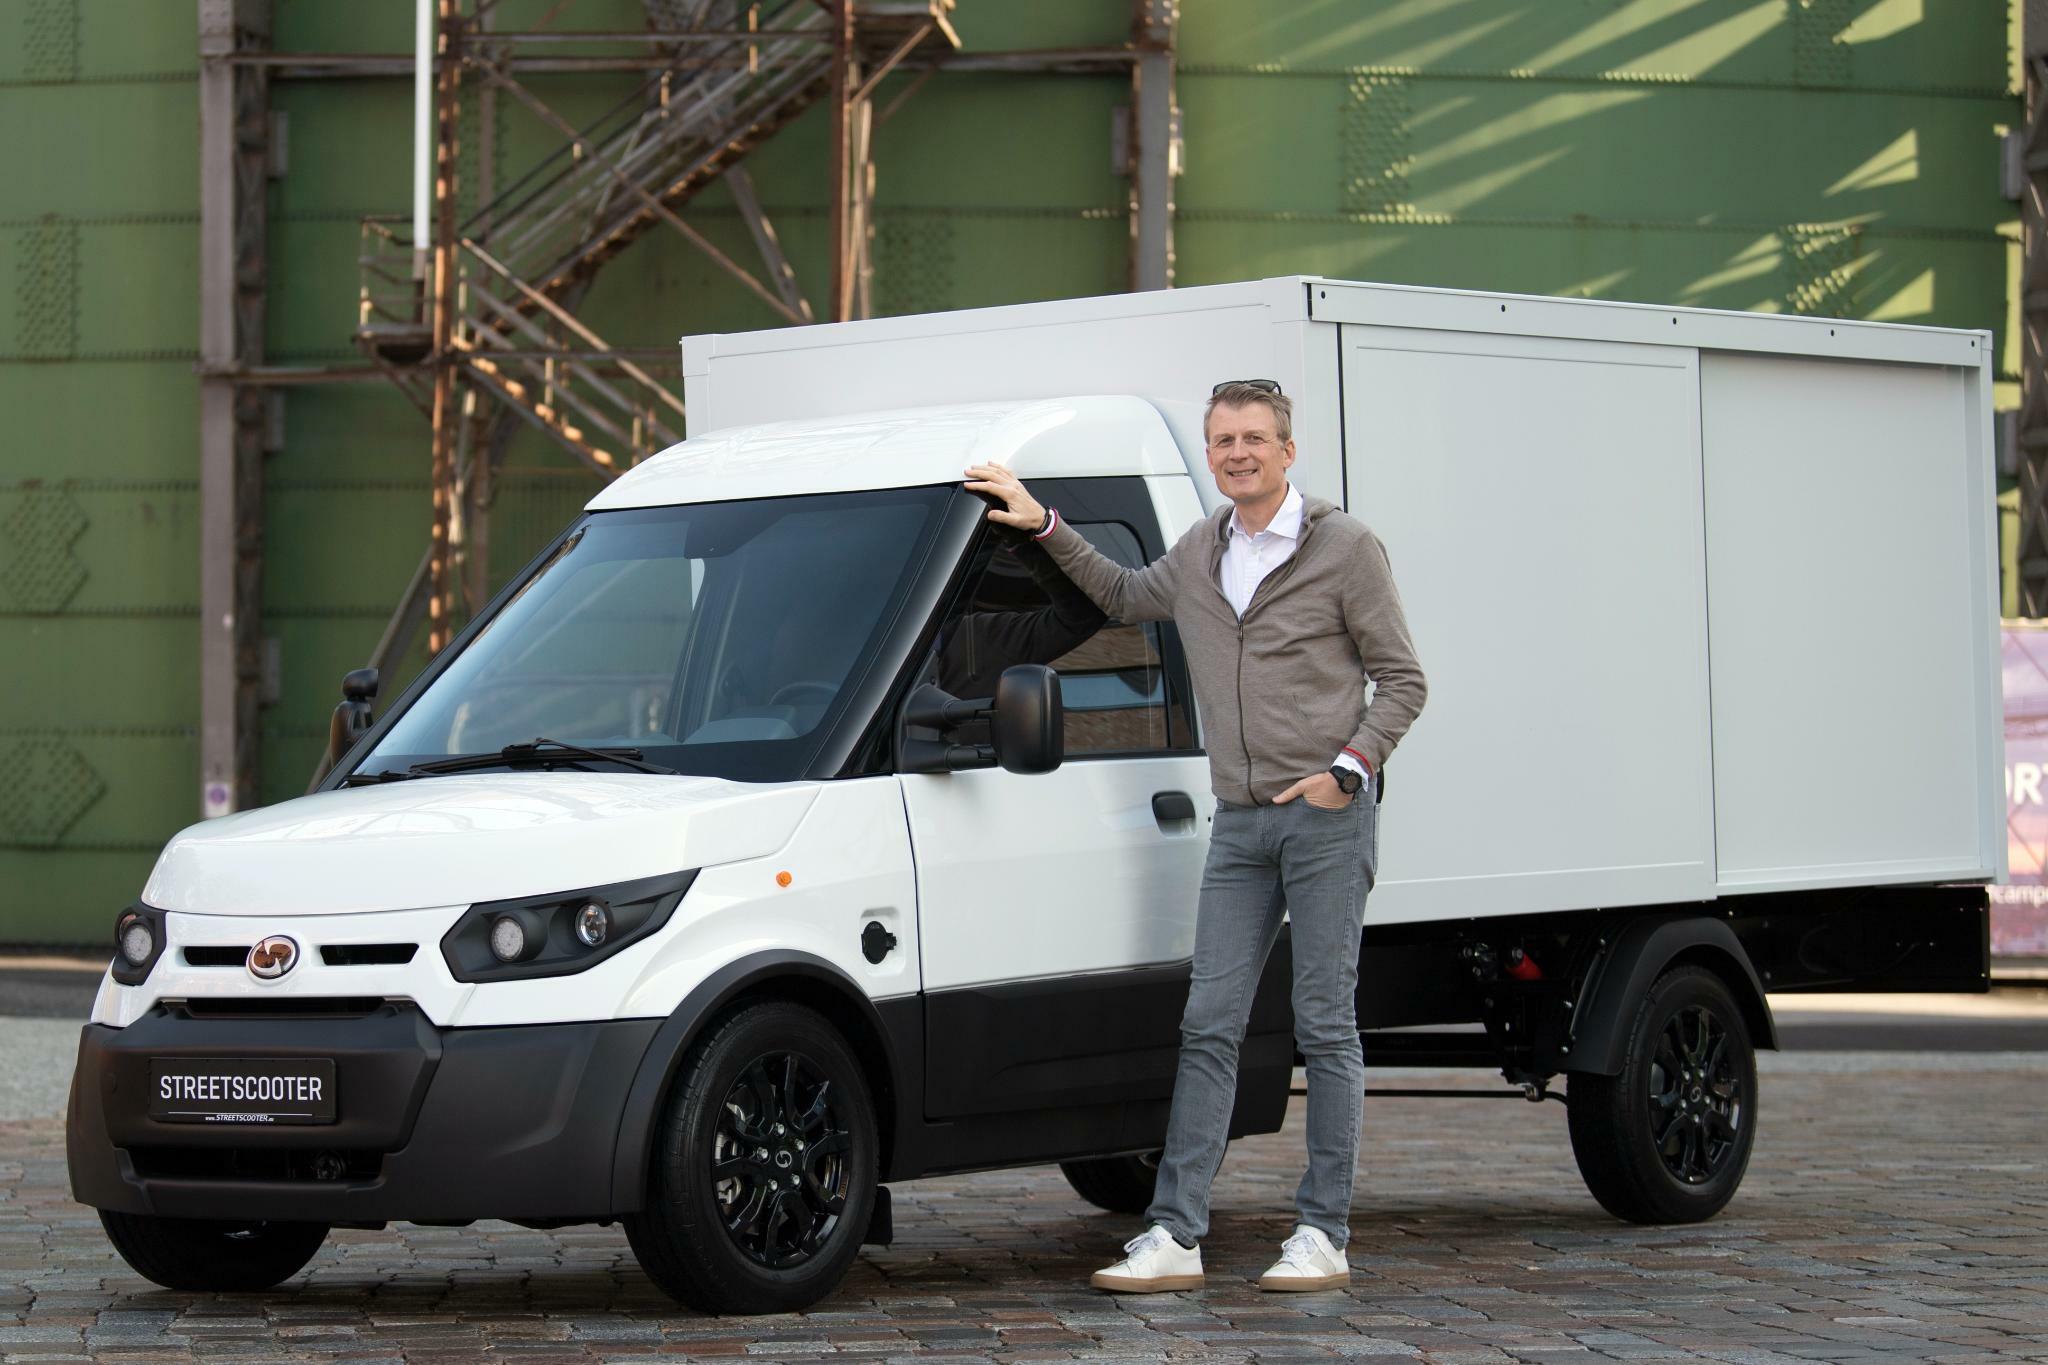 Streetscooter-Chef Jörg Sommer hat große Pläne